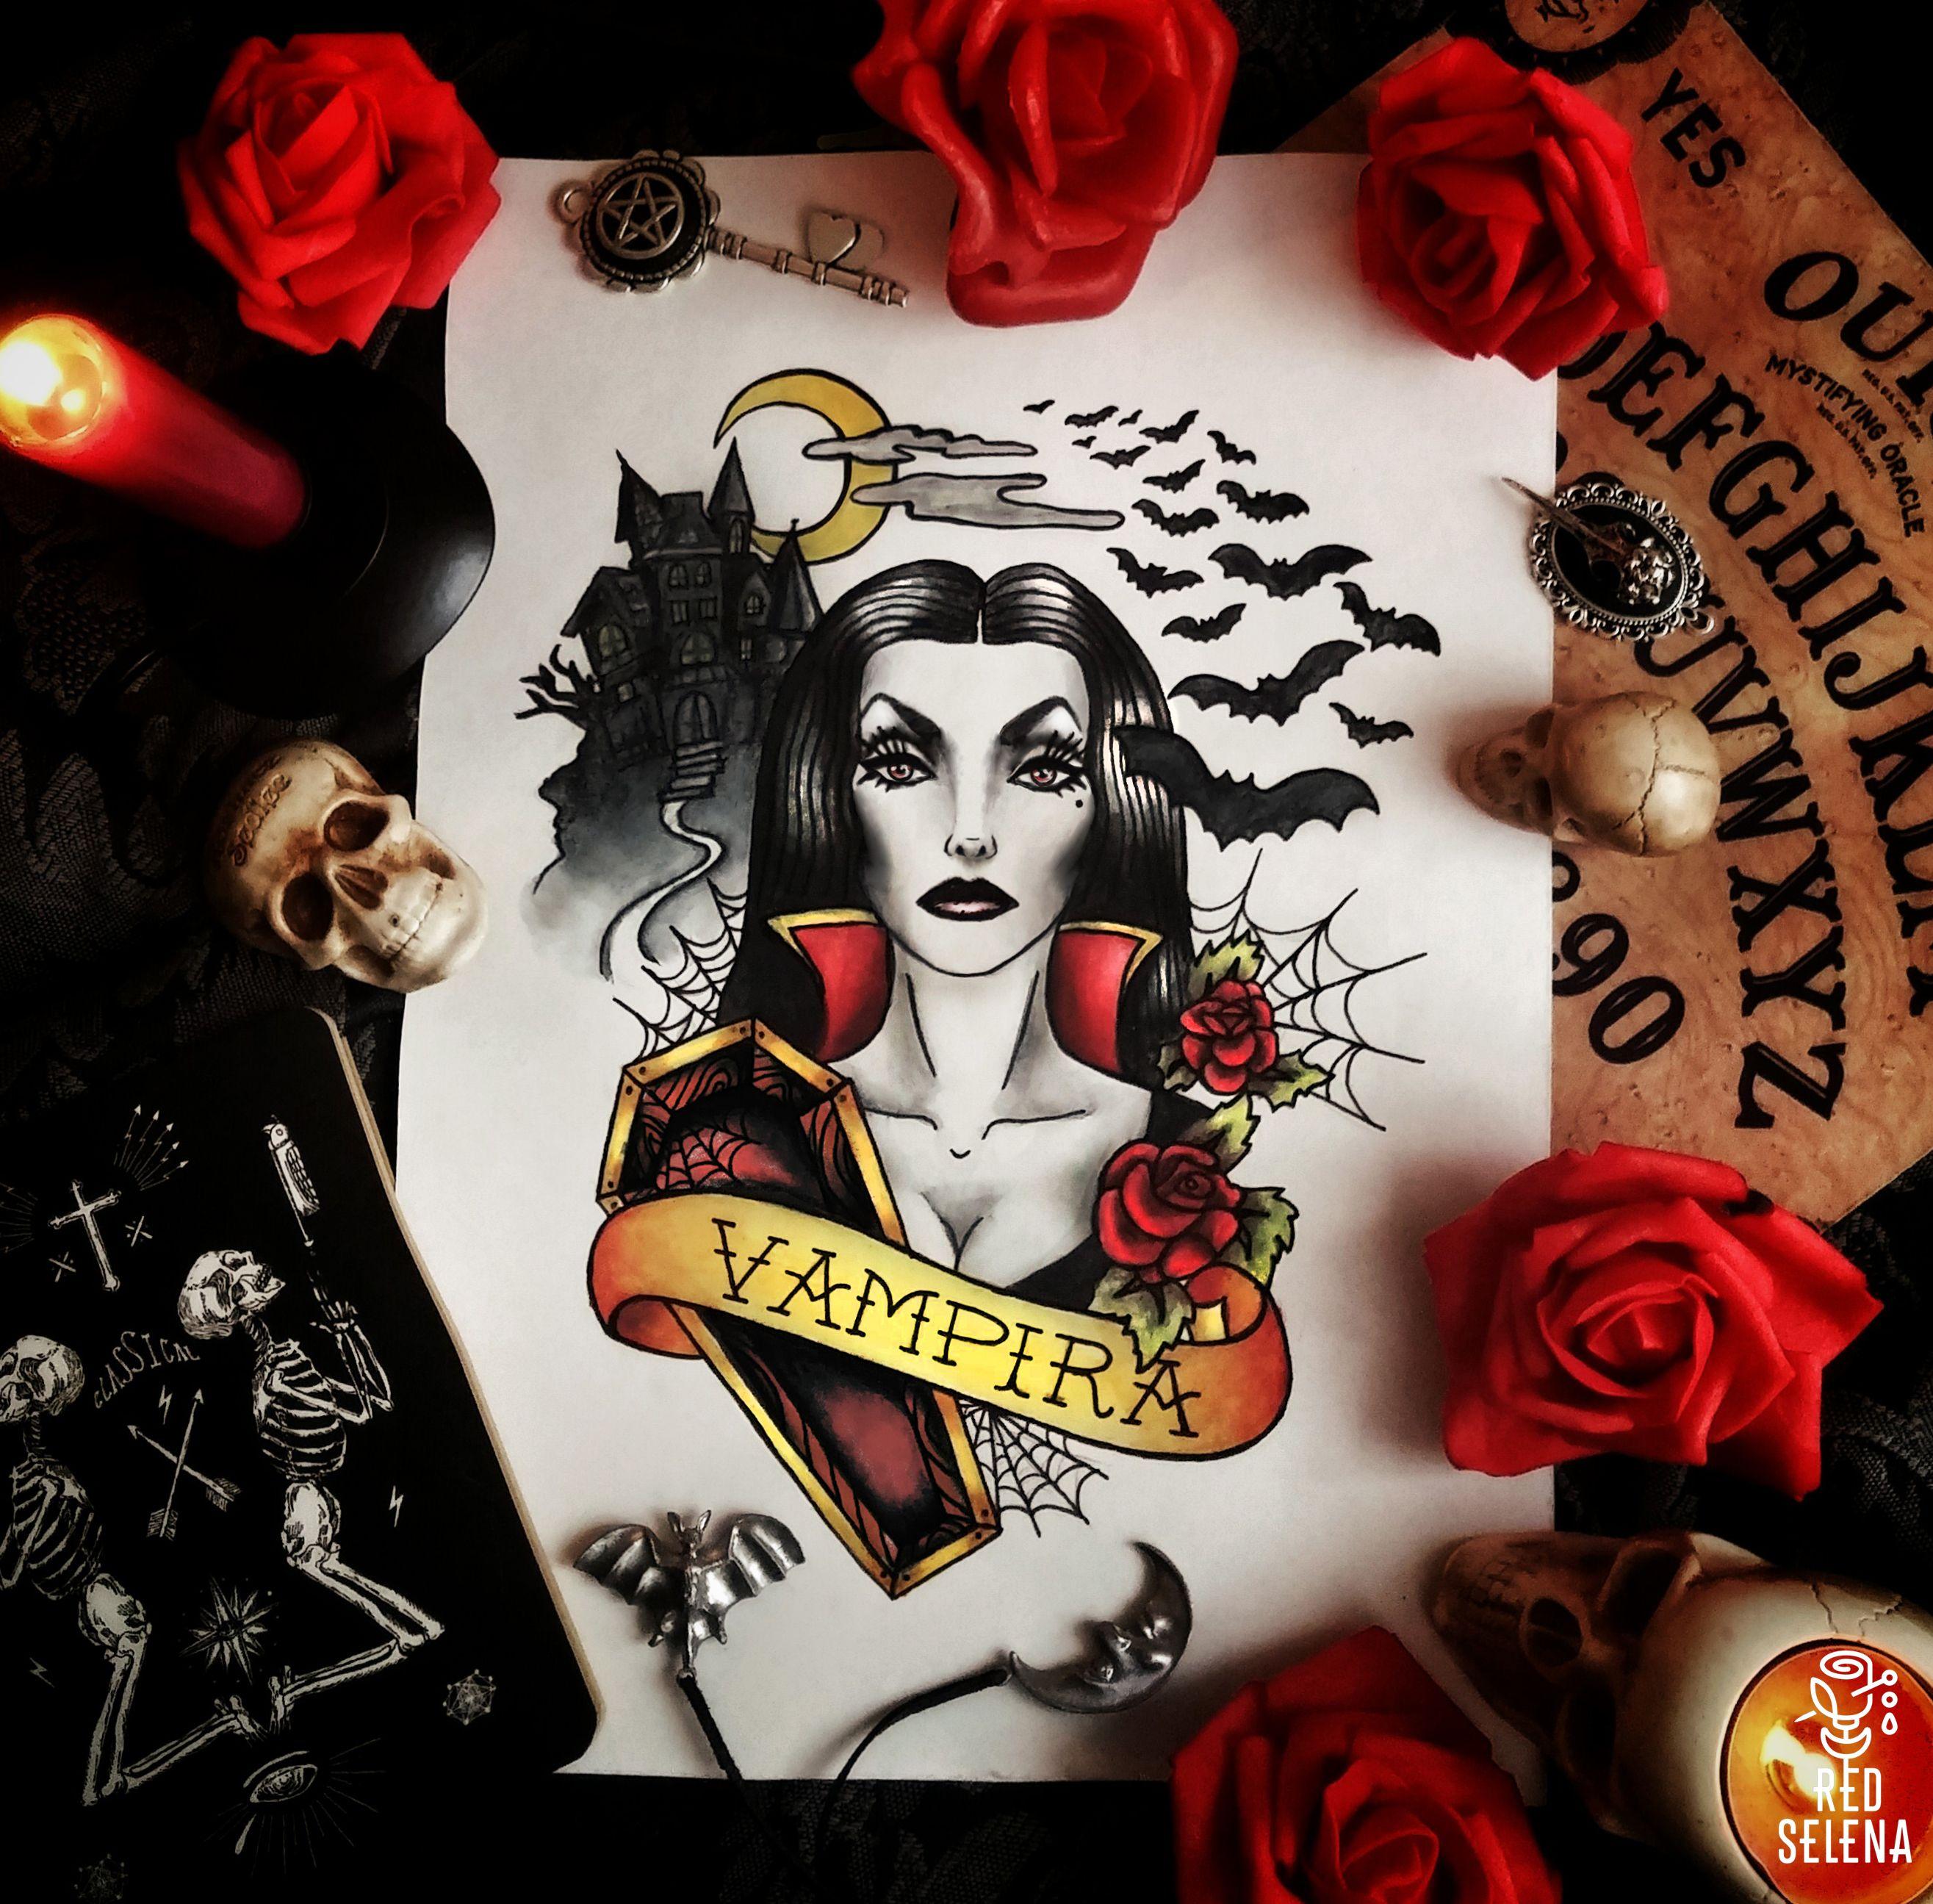 Vampira Tattoo Maila Nurmi Vampira Ta...